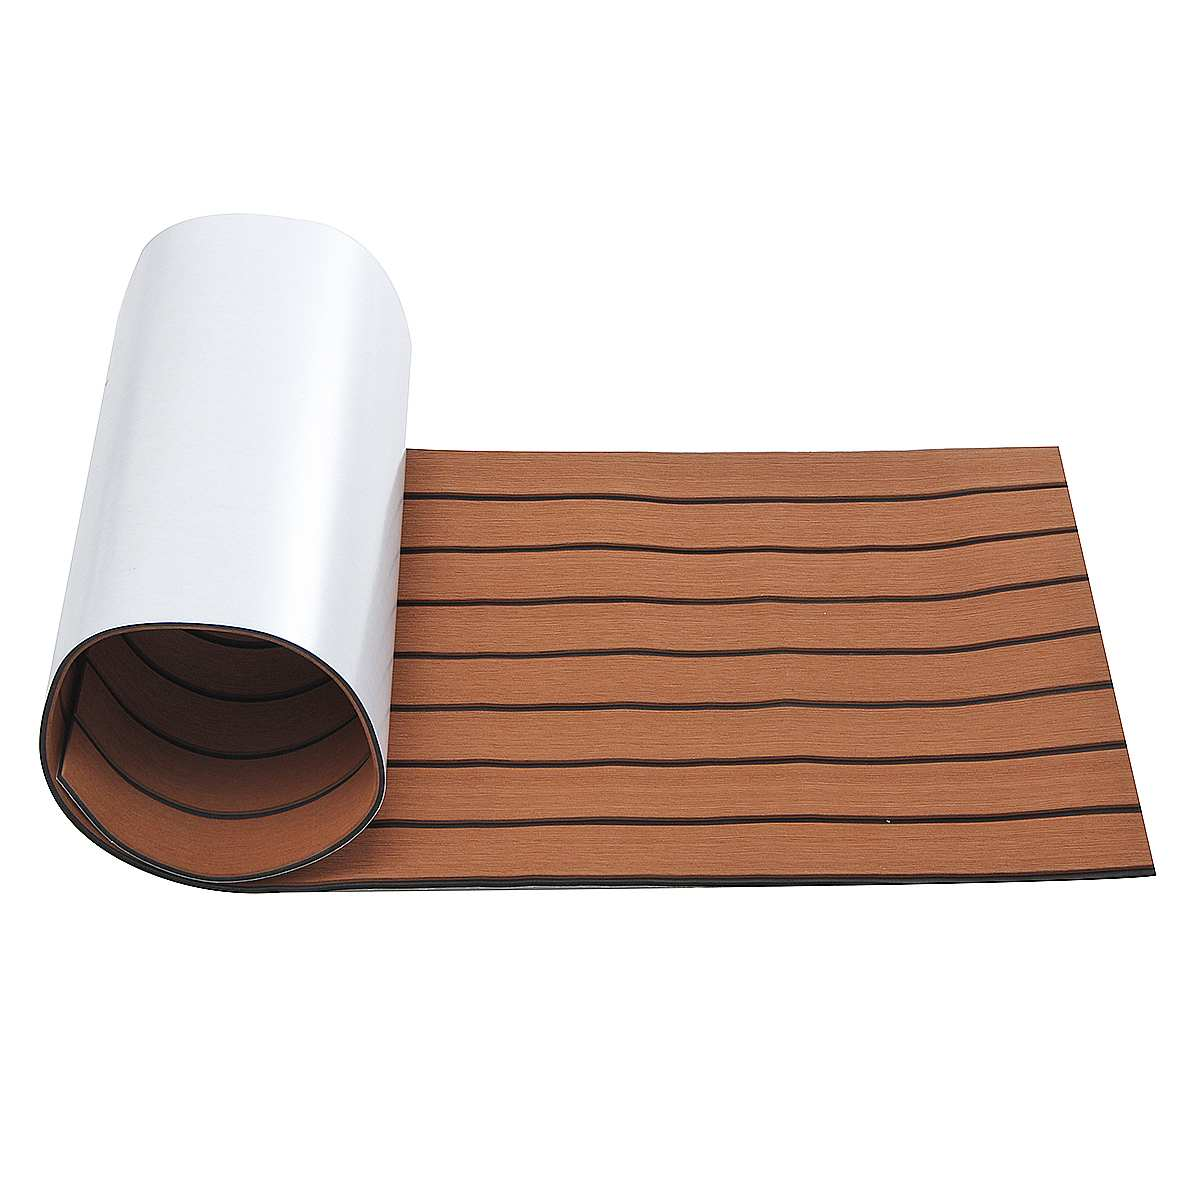 Self Adhesive Marine Floor EVA Foam Imitated Teak Boat Deck Mat Brown Yacht Flooring Anti Skid MatRecreational Vehicle Pad